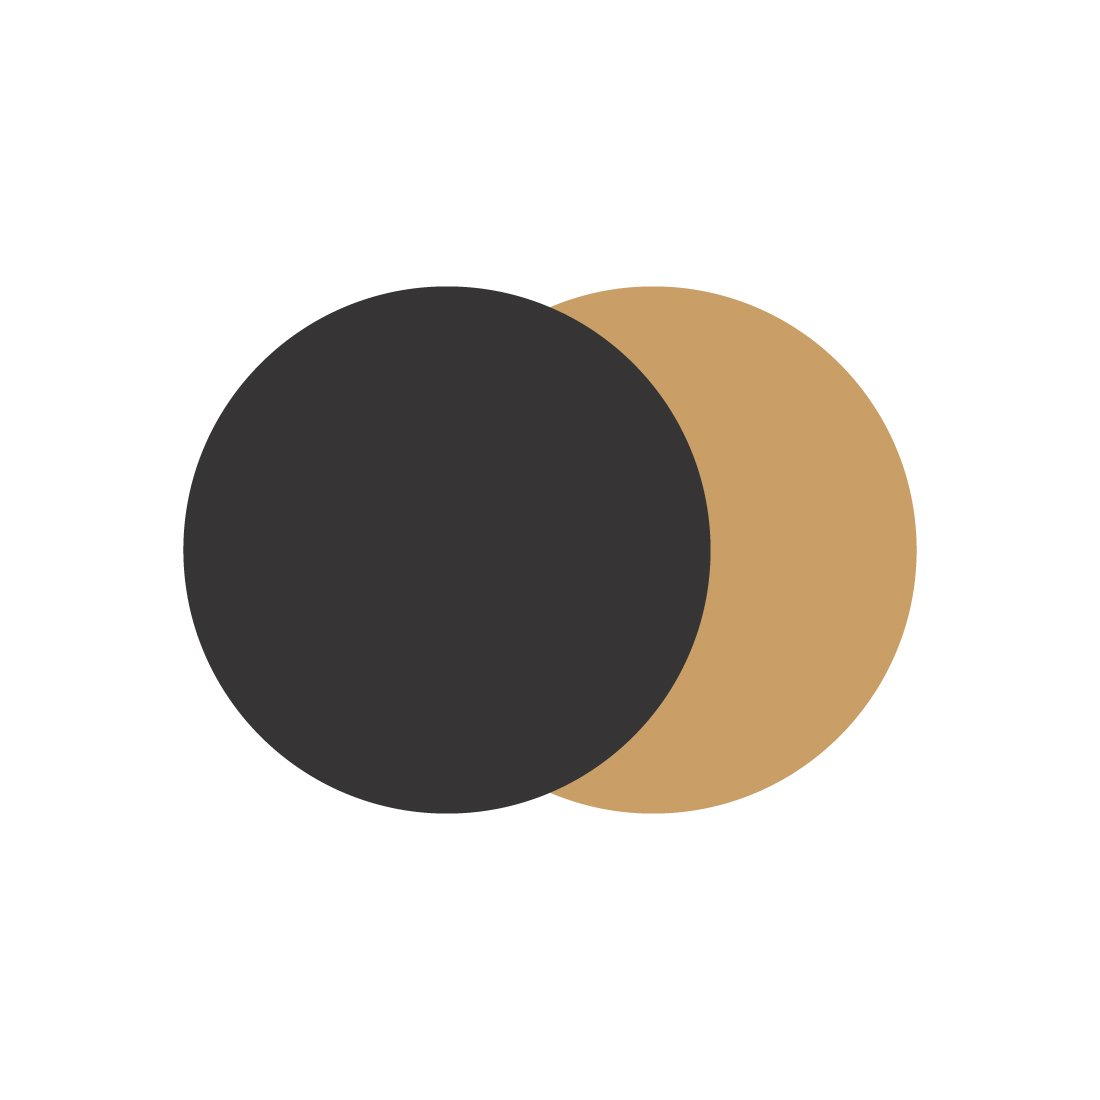 Marset Scotch Plafondlamp Zwart - Goud